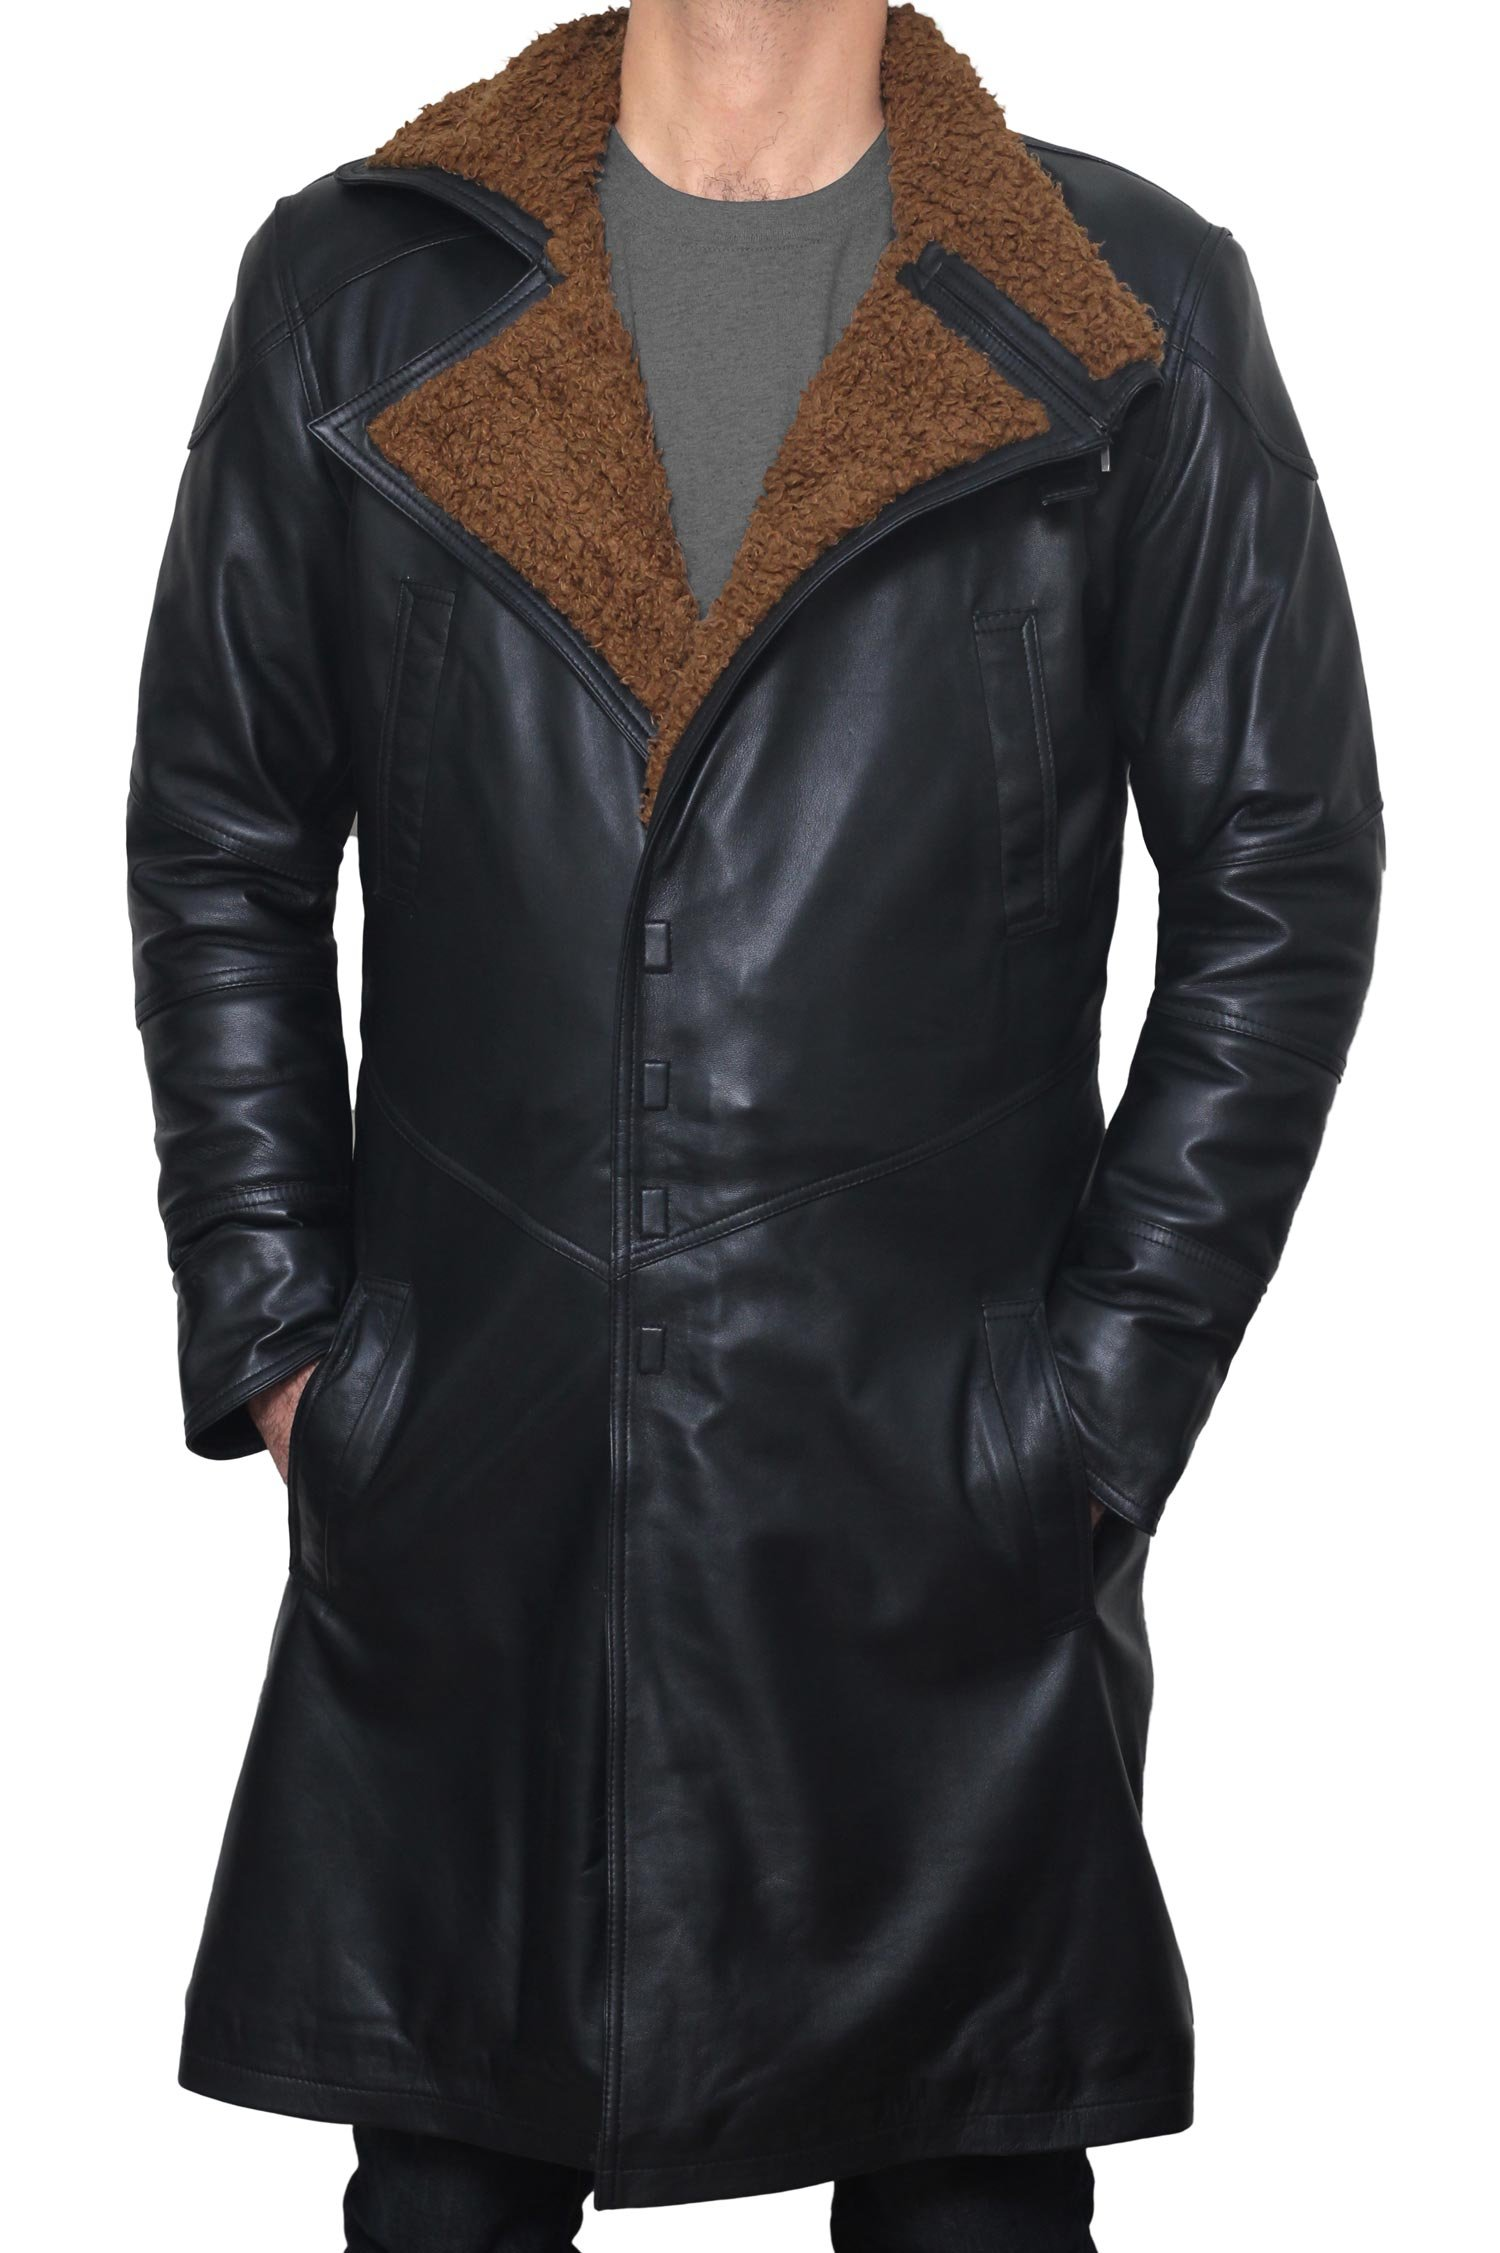 BlingSoul Blade Fur Coat Men Costume - Boys Black Leather Coat (XL) [PU-BLRN-BL-XL] by BlingSoul (Image #3)